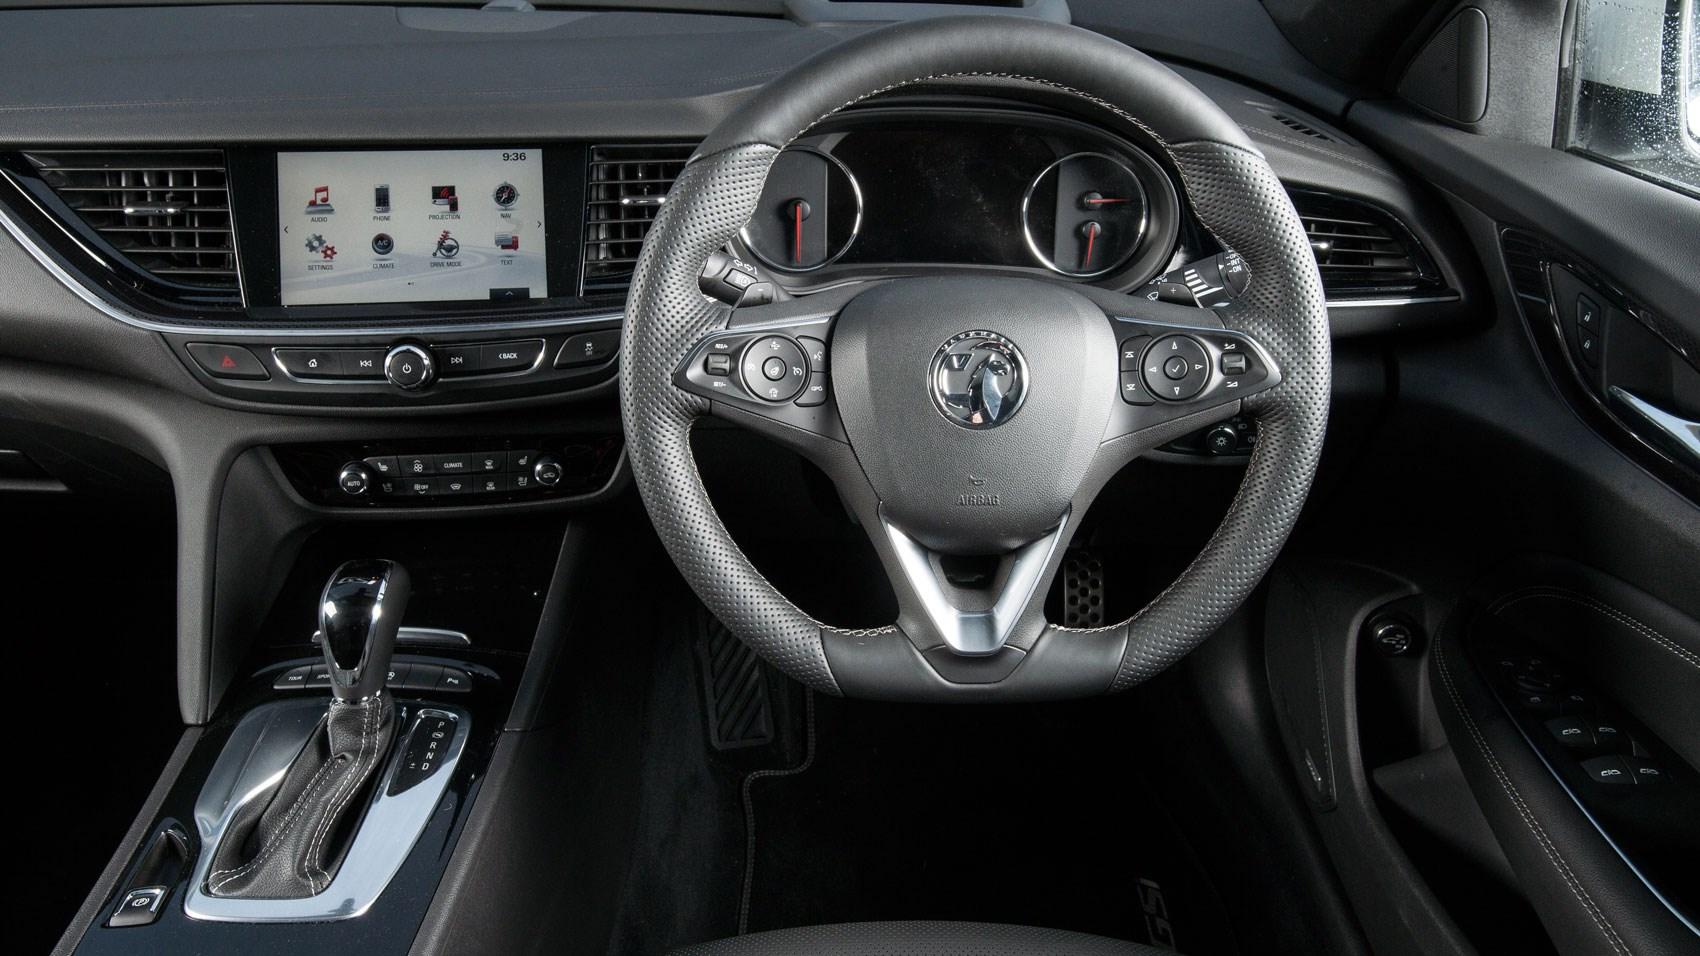 Car Leasing Deals Uk >> Vauxhall Insignia GSi Sports Tourer diesel estate (2018) review: going old school | CAR Magazine